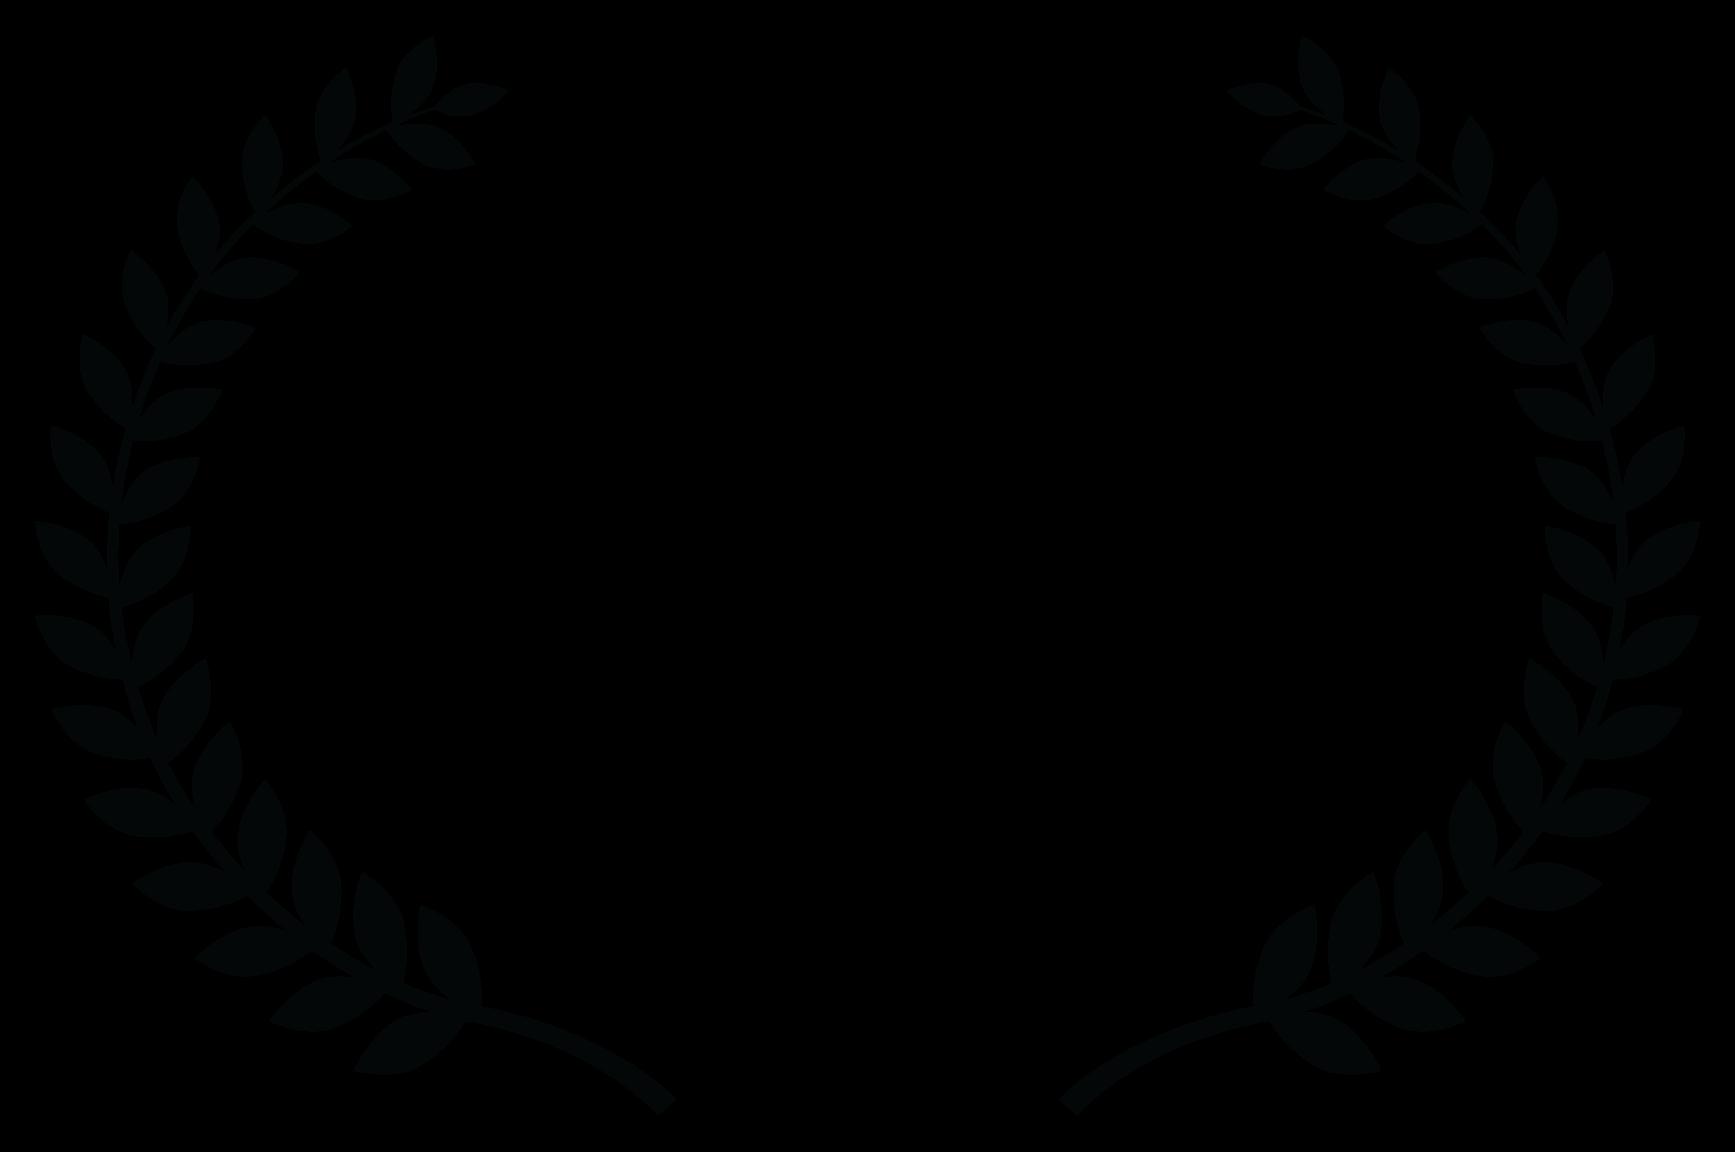 OFFICIAL SELECTION - Golden State Film Festival - 2021 (1)